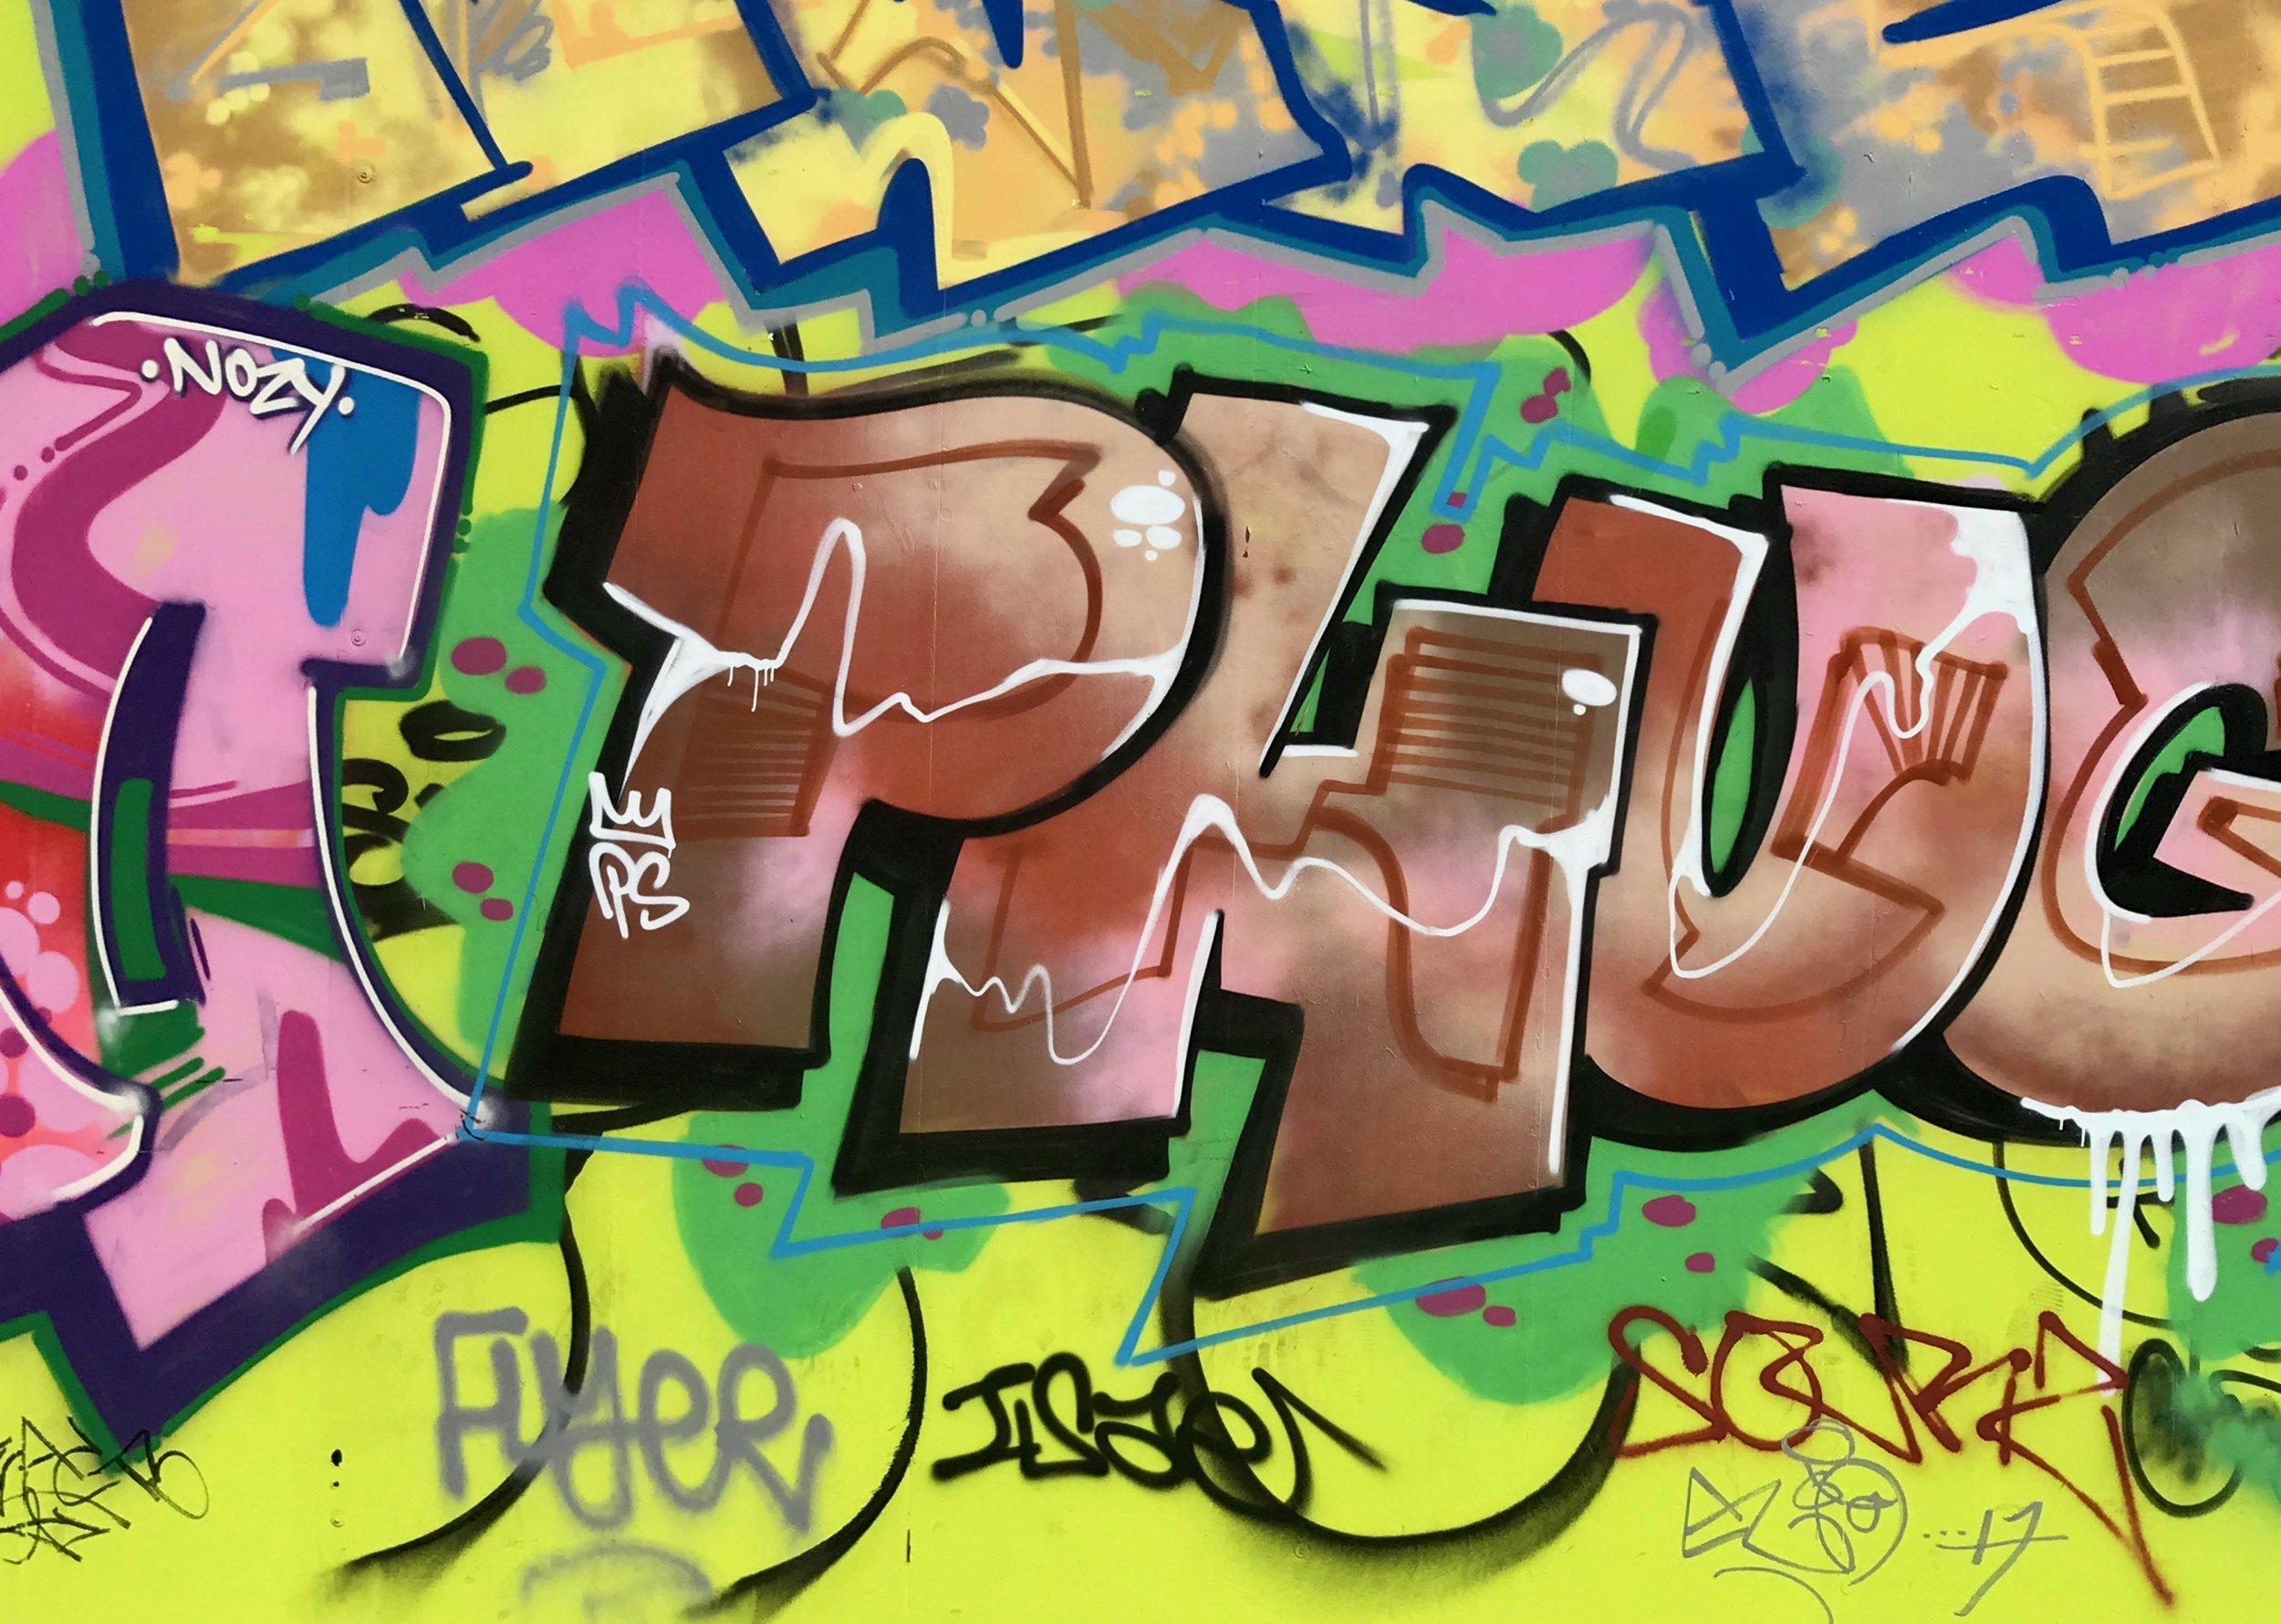 Graffiti Phug. Notting Hill Carnival